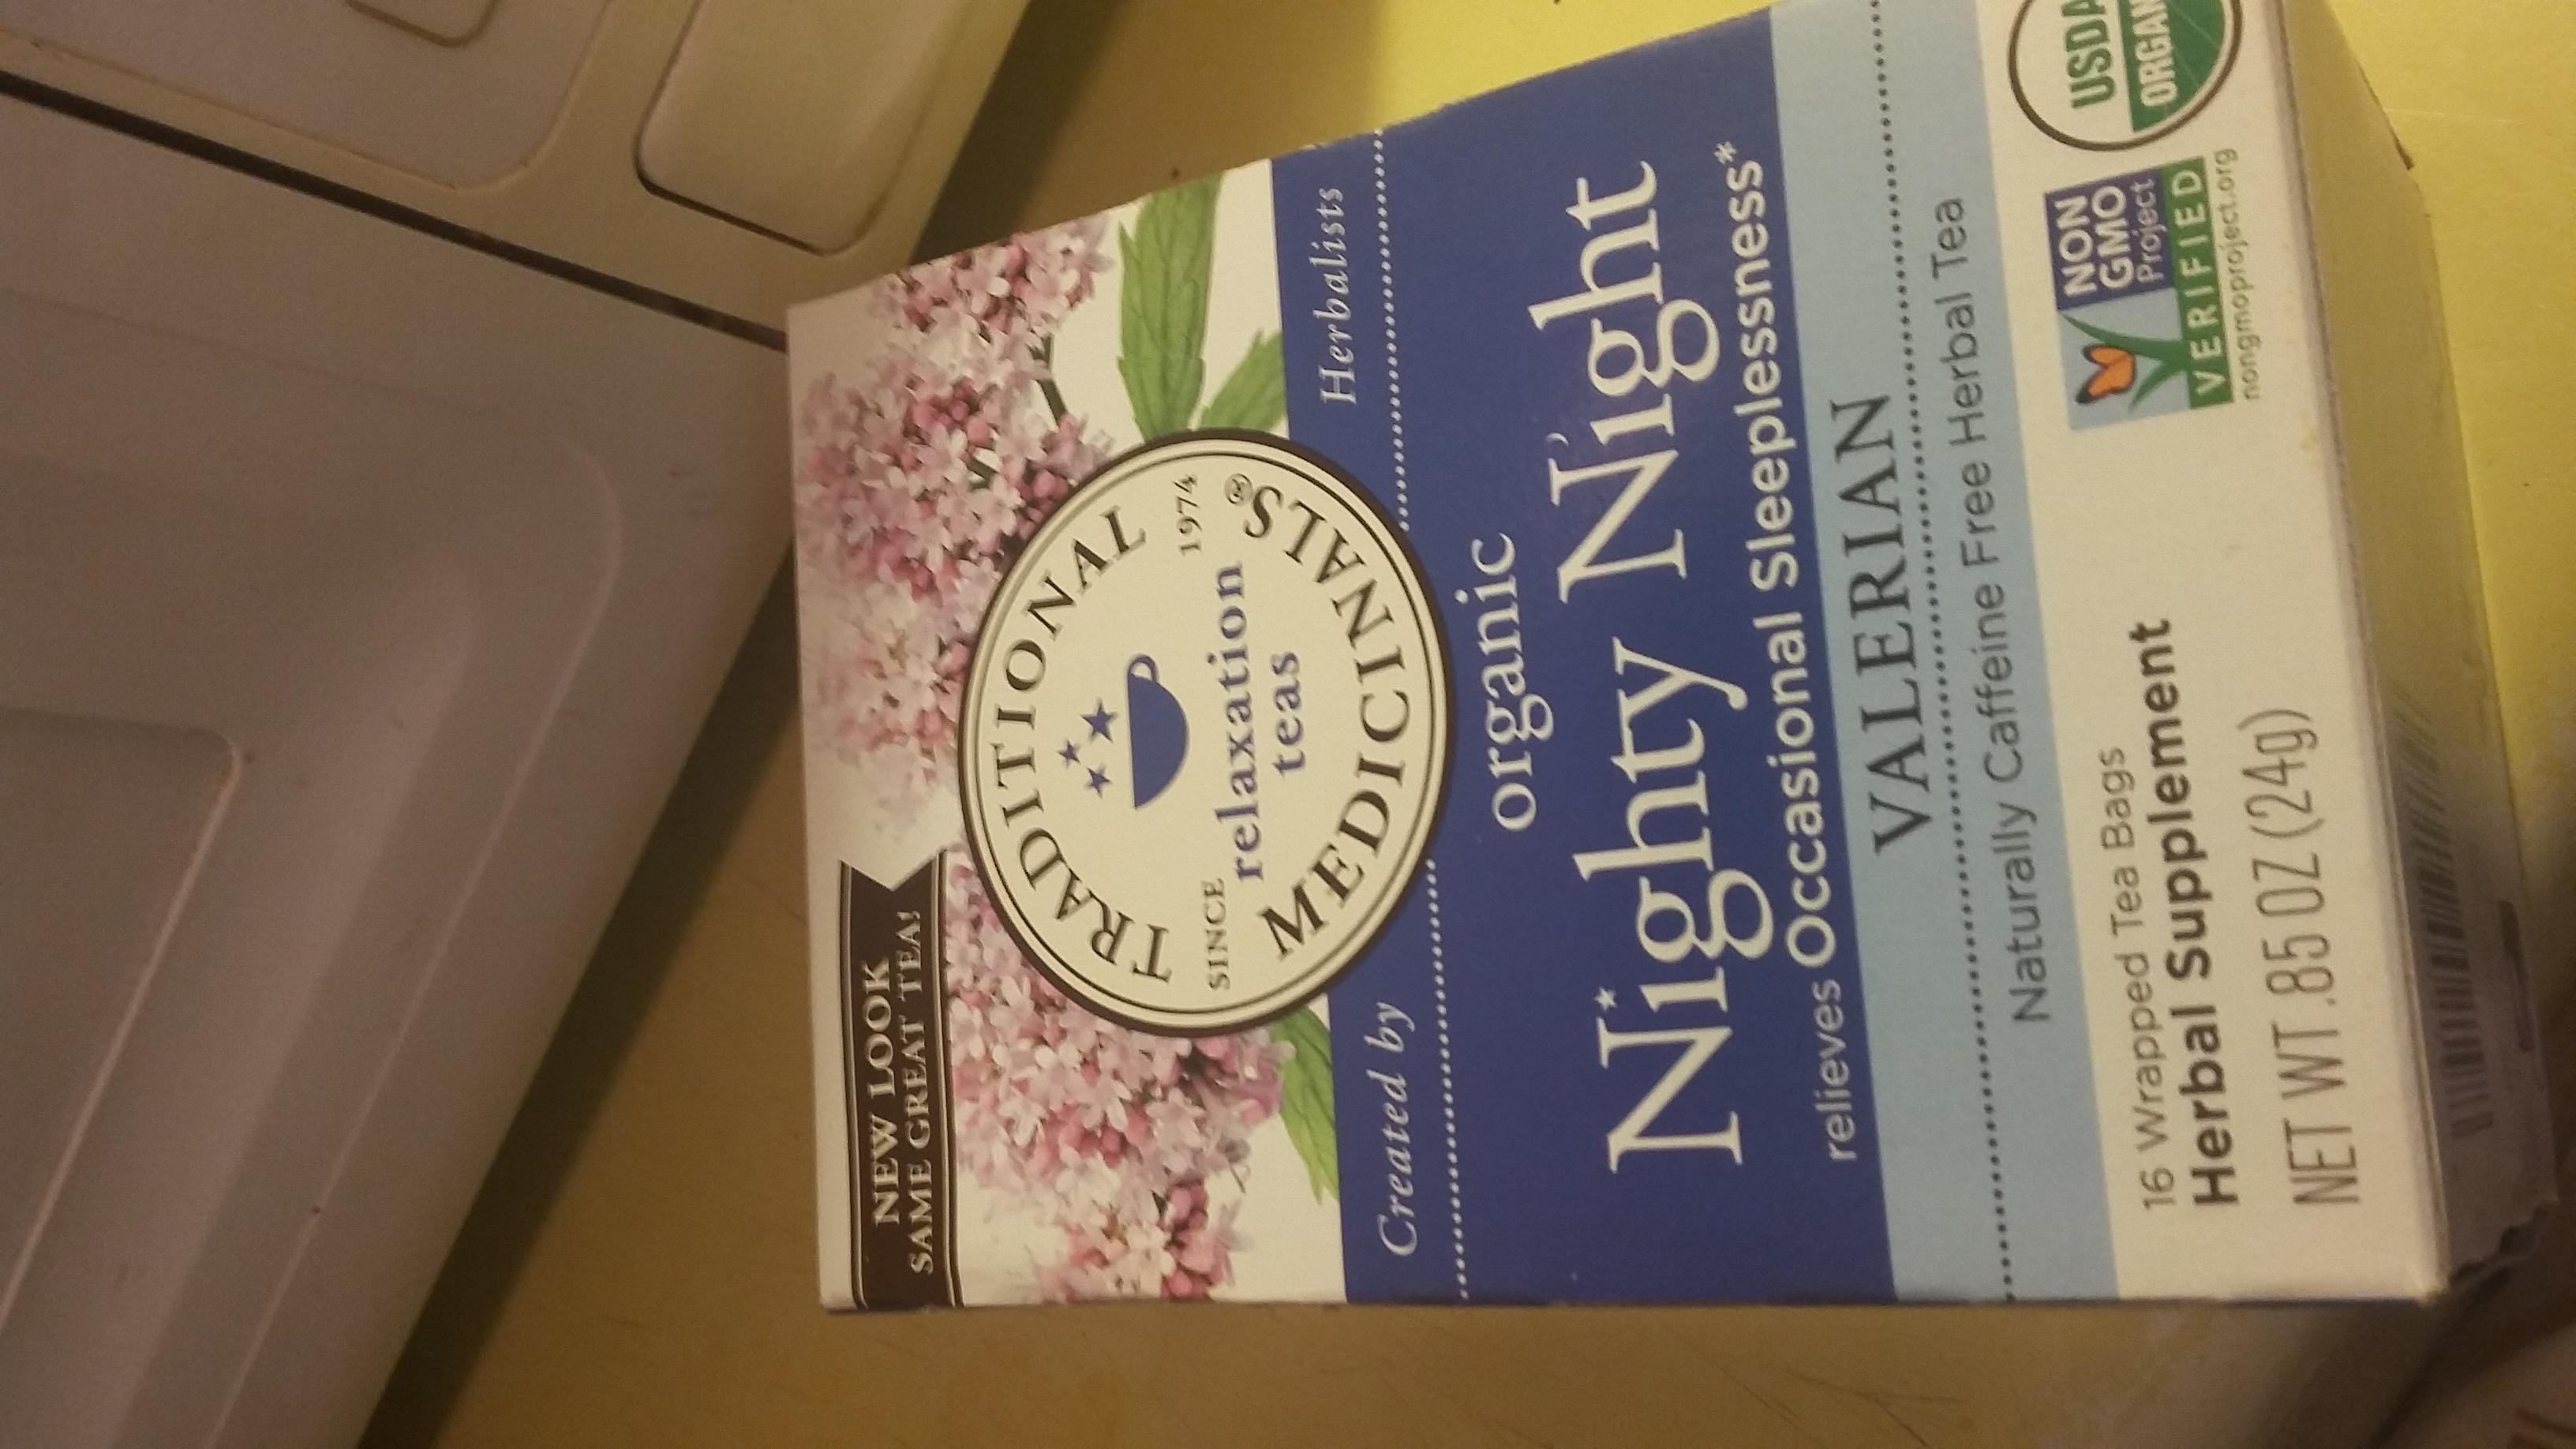 Traditional Medicinals Nighty Night Tea uploaded by Sharon B.